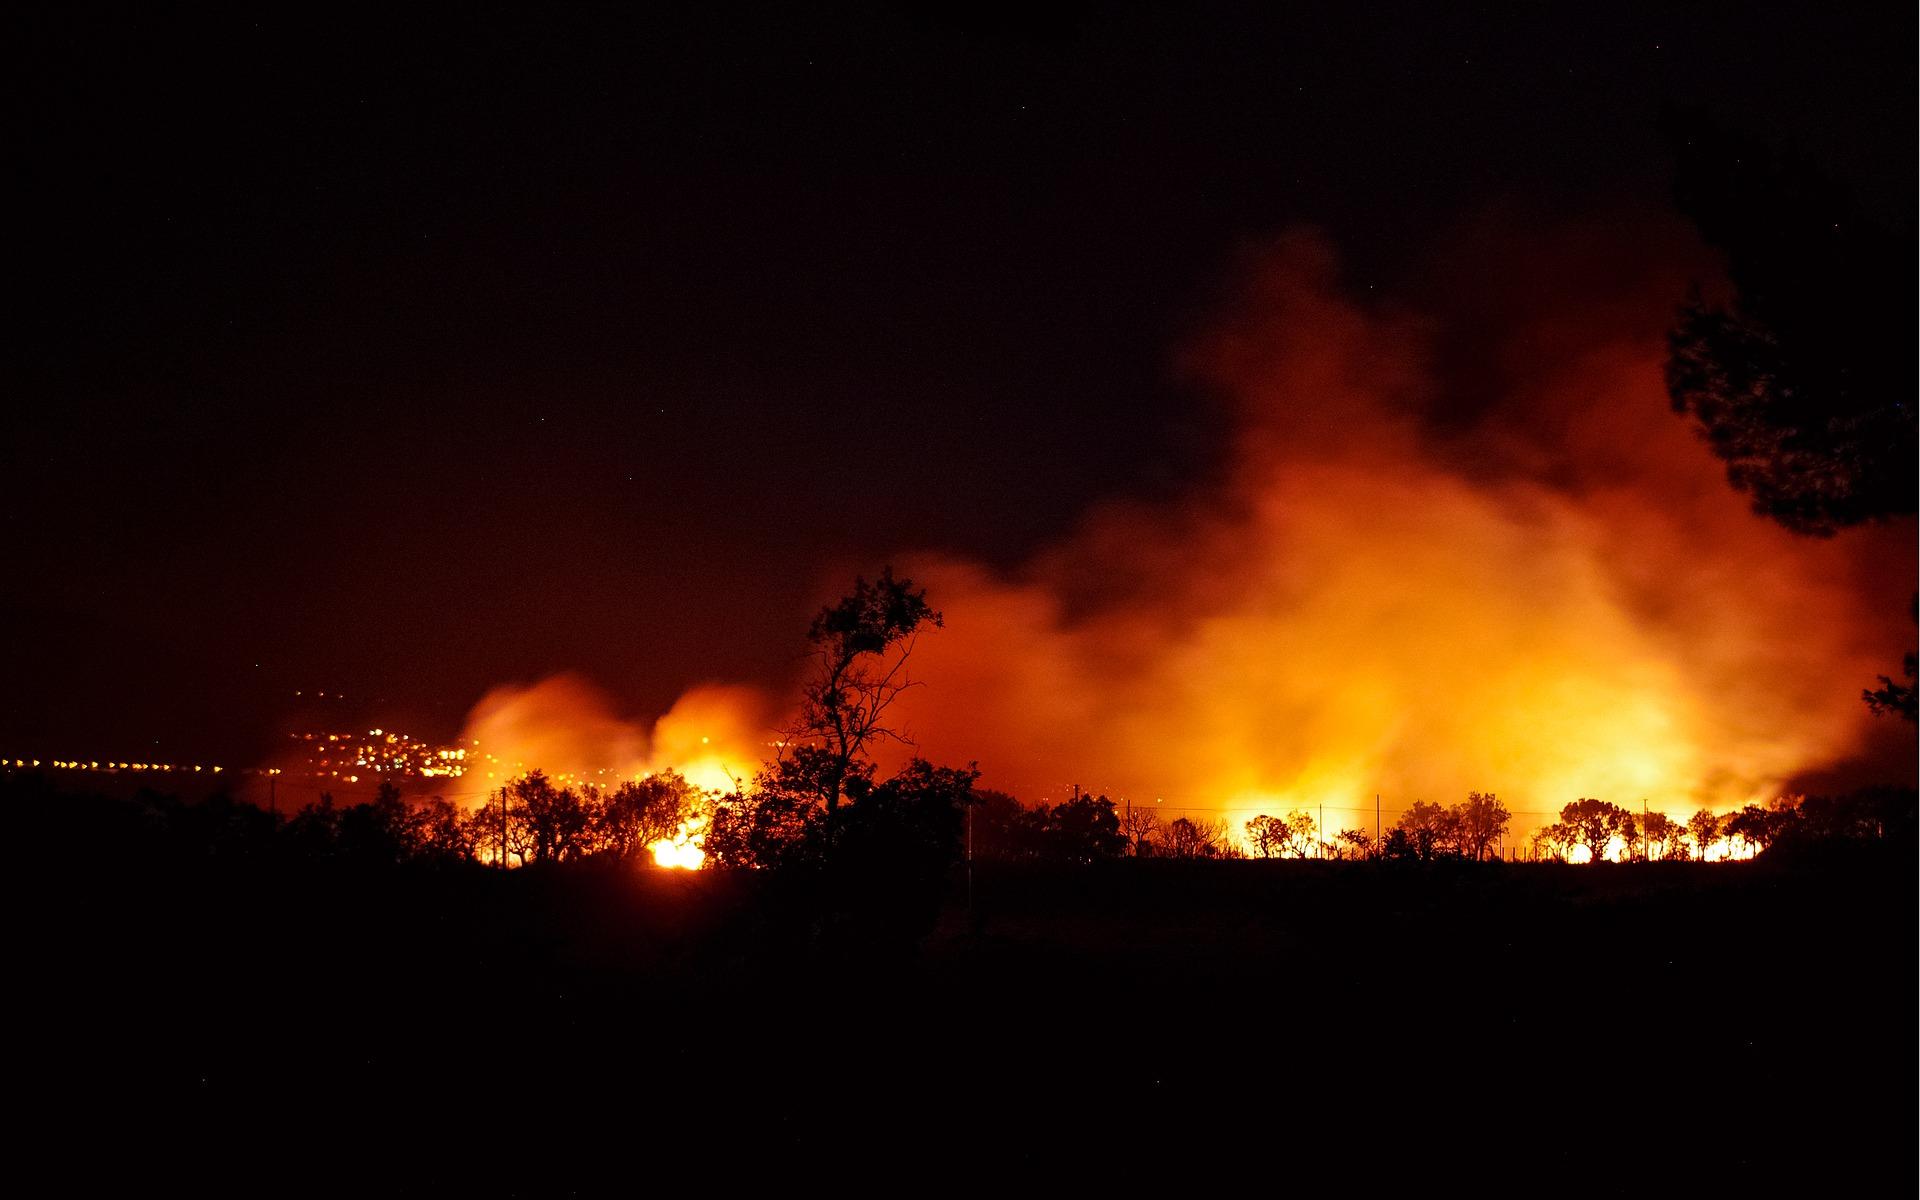 Incendios forestales - Drexmin